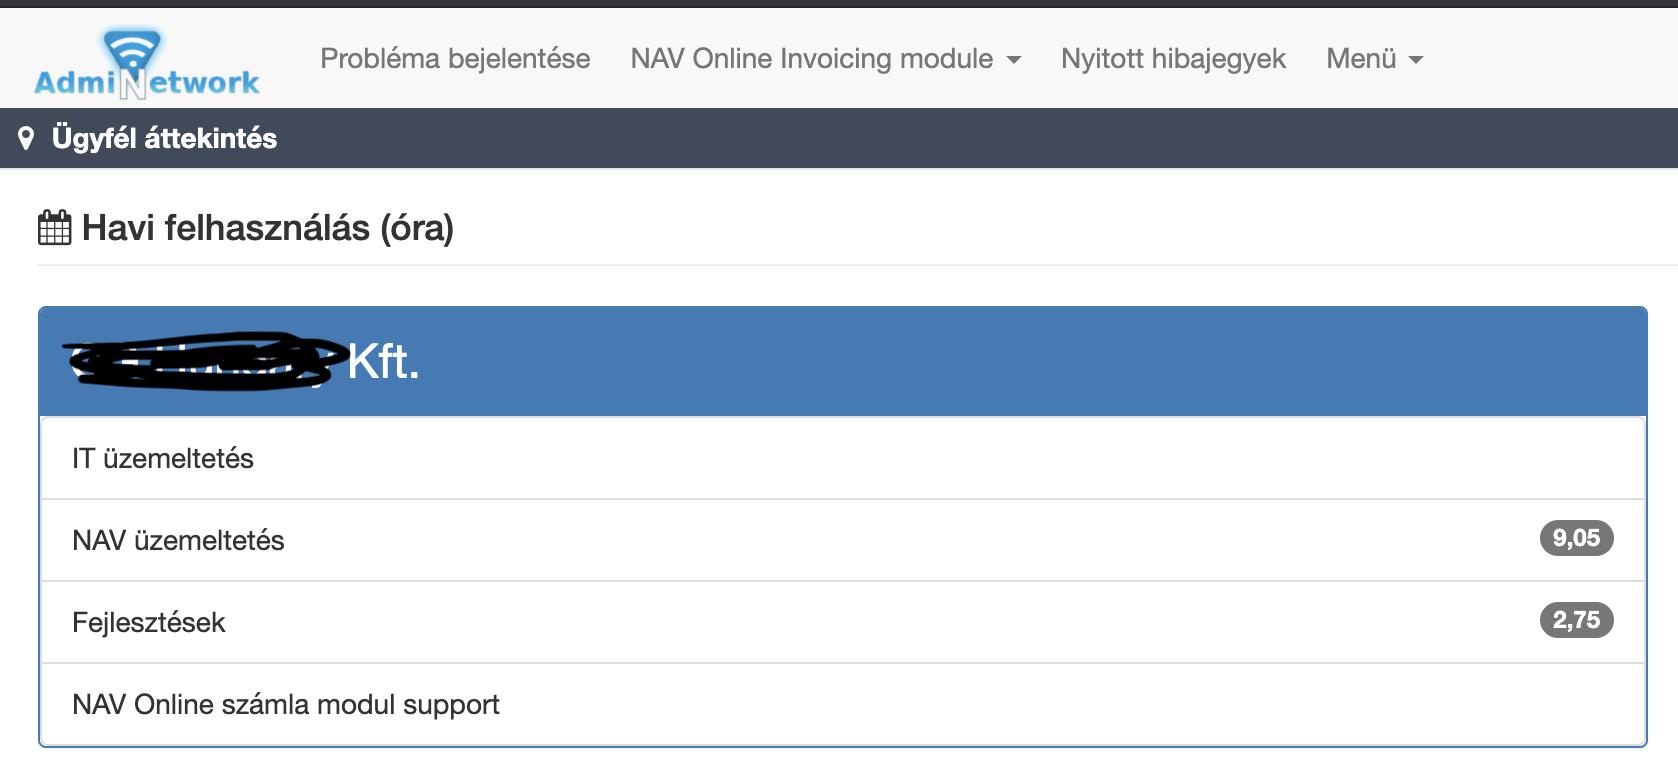 AdmiNetwork Support Portal